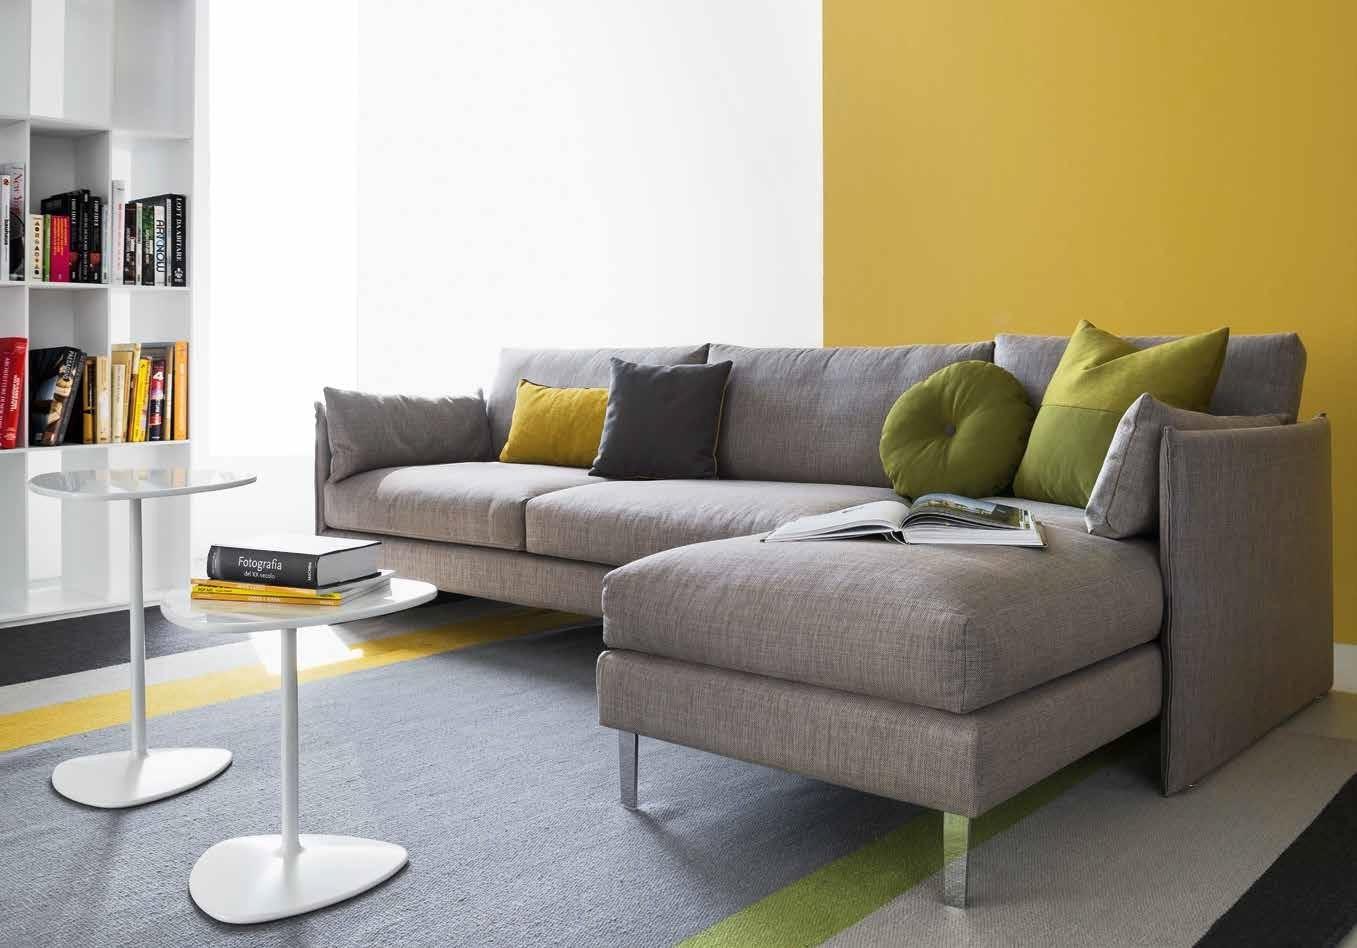 Urban Sectional Sofa Cs/3369, Calligaris Italy – Italmoda Furniture Inside Nashua Nh Sectional Sofas (Photo 3 of 10)